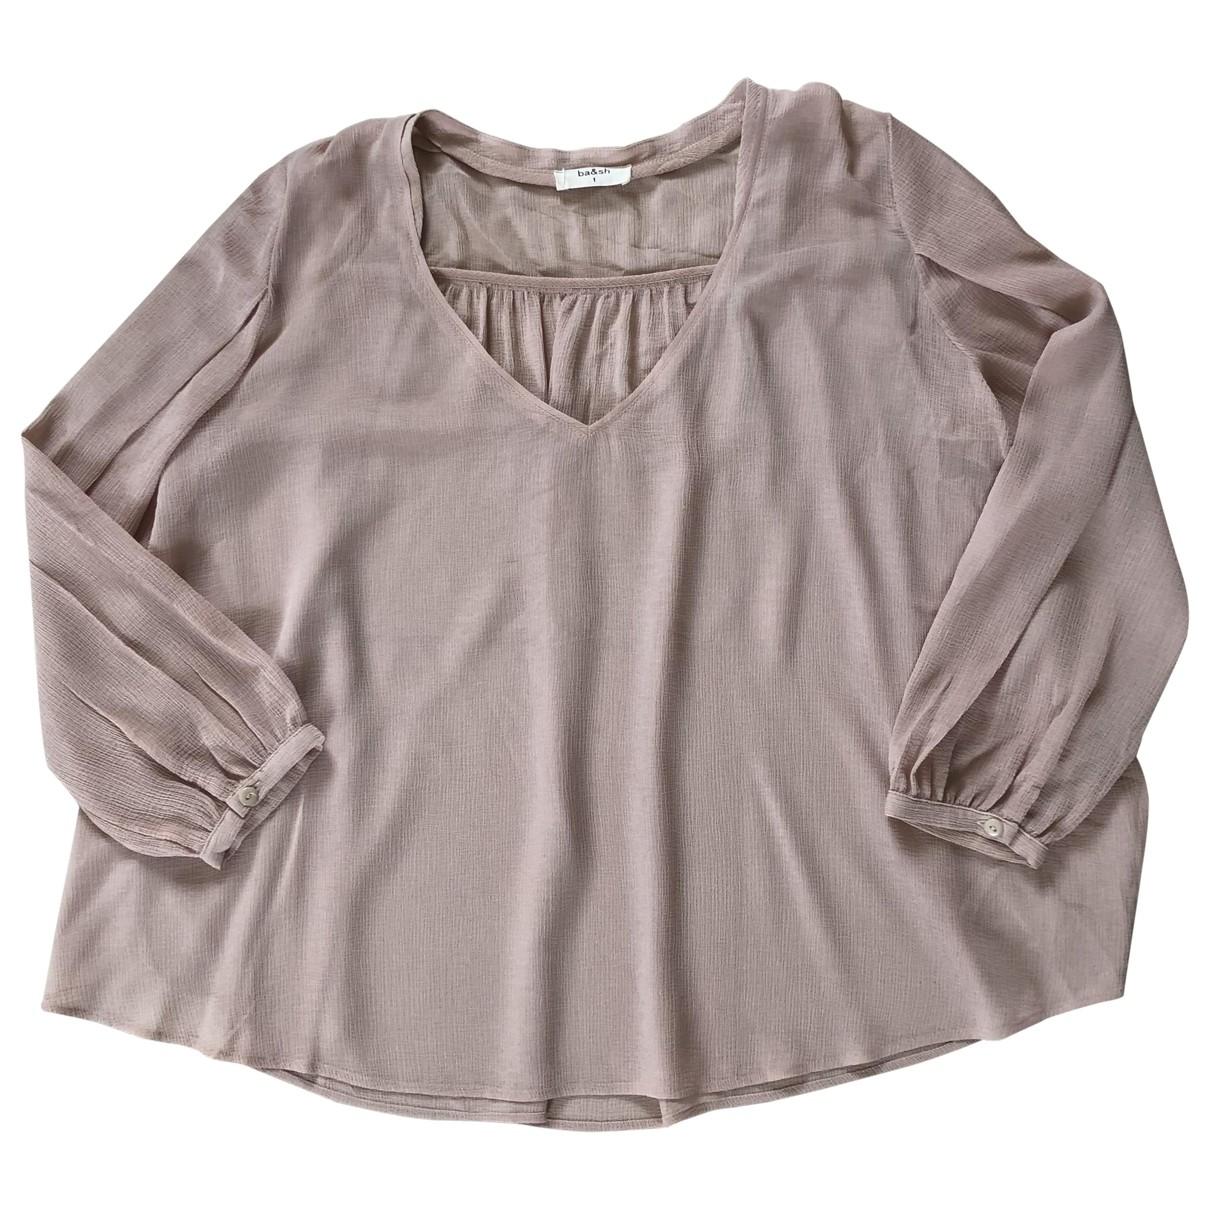 Ba&sh \N Pink  top for Women 1 0-5